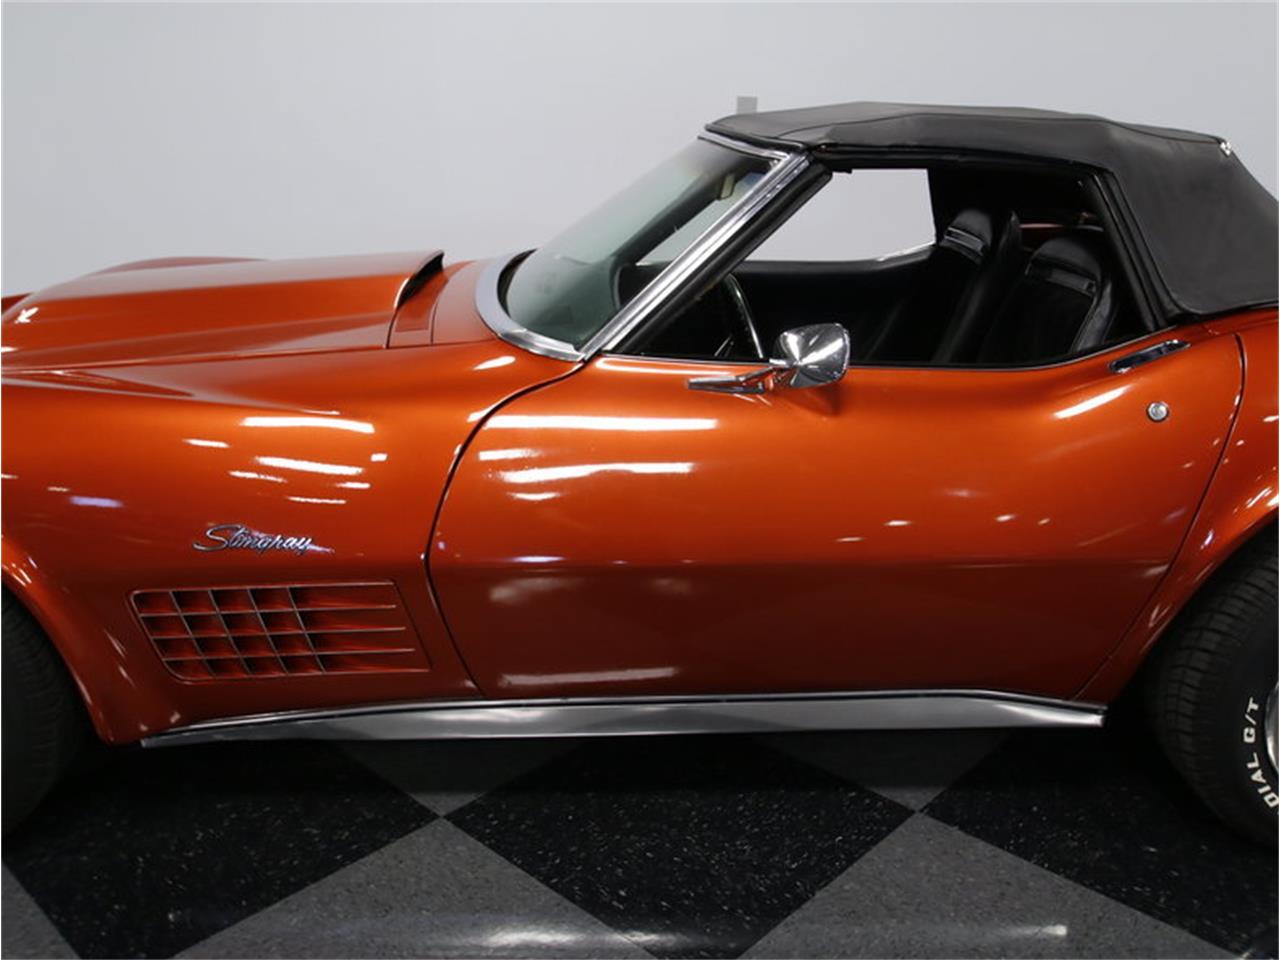 Large Picture of Classic '70 Corvette located in Concord North Carolina Offered by Streetside Classics - Charlotte - JTQZ